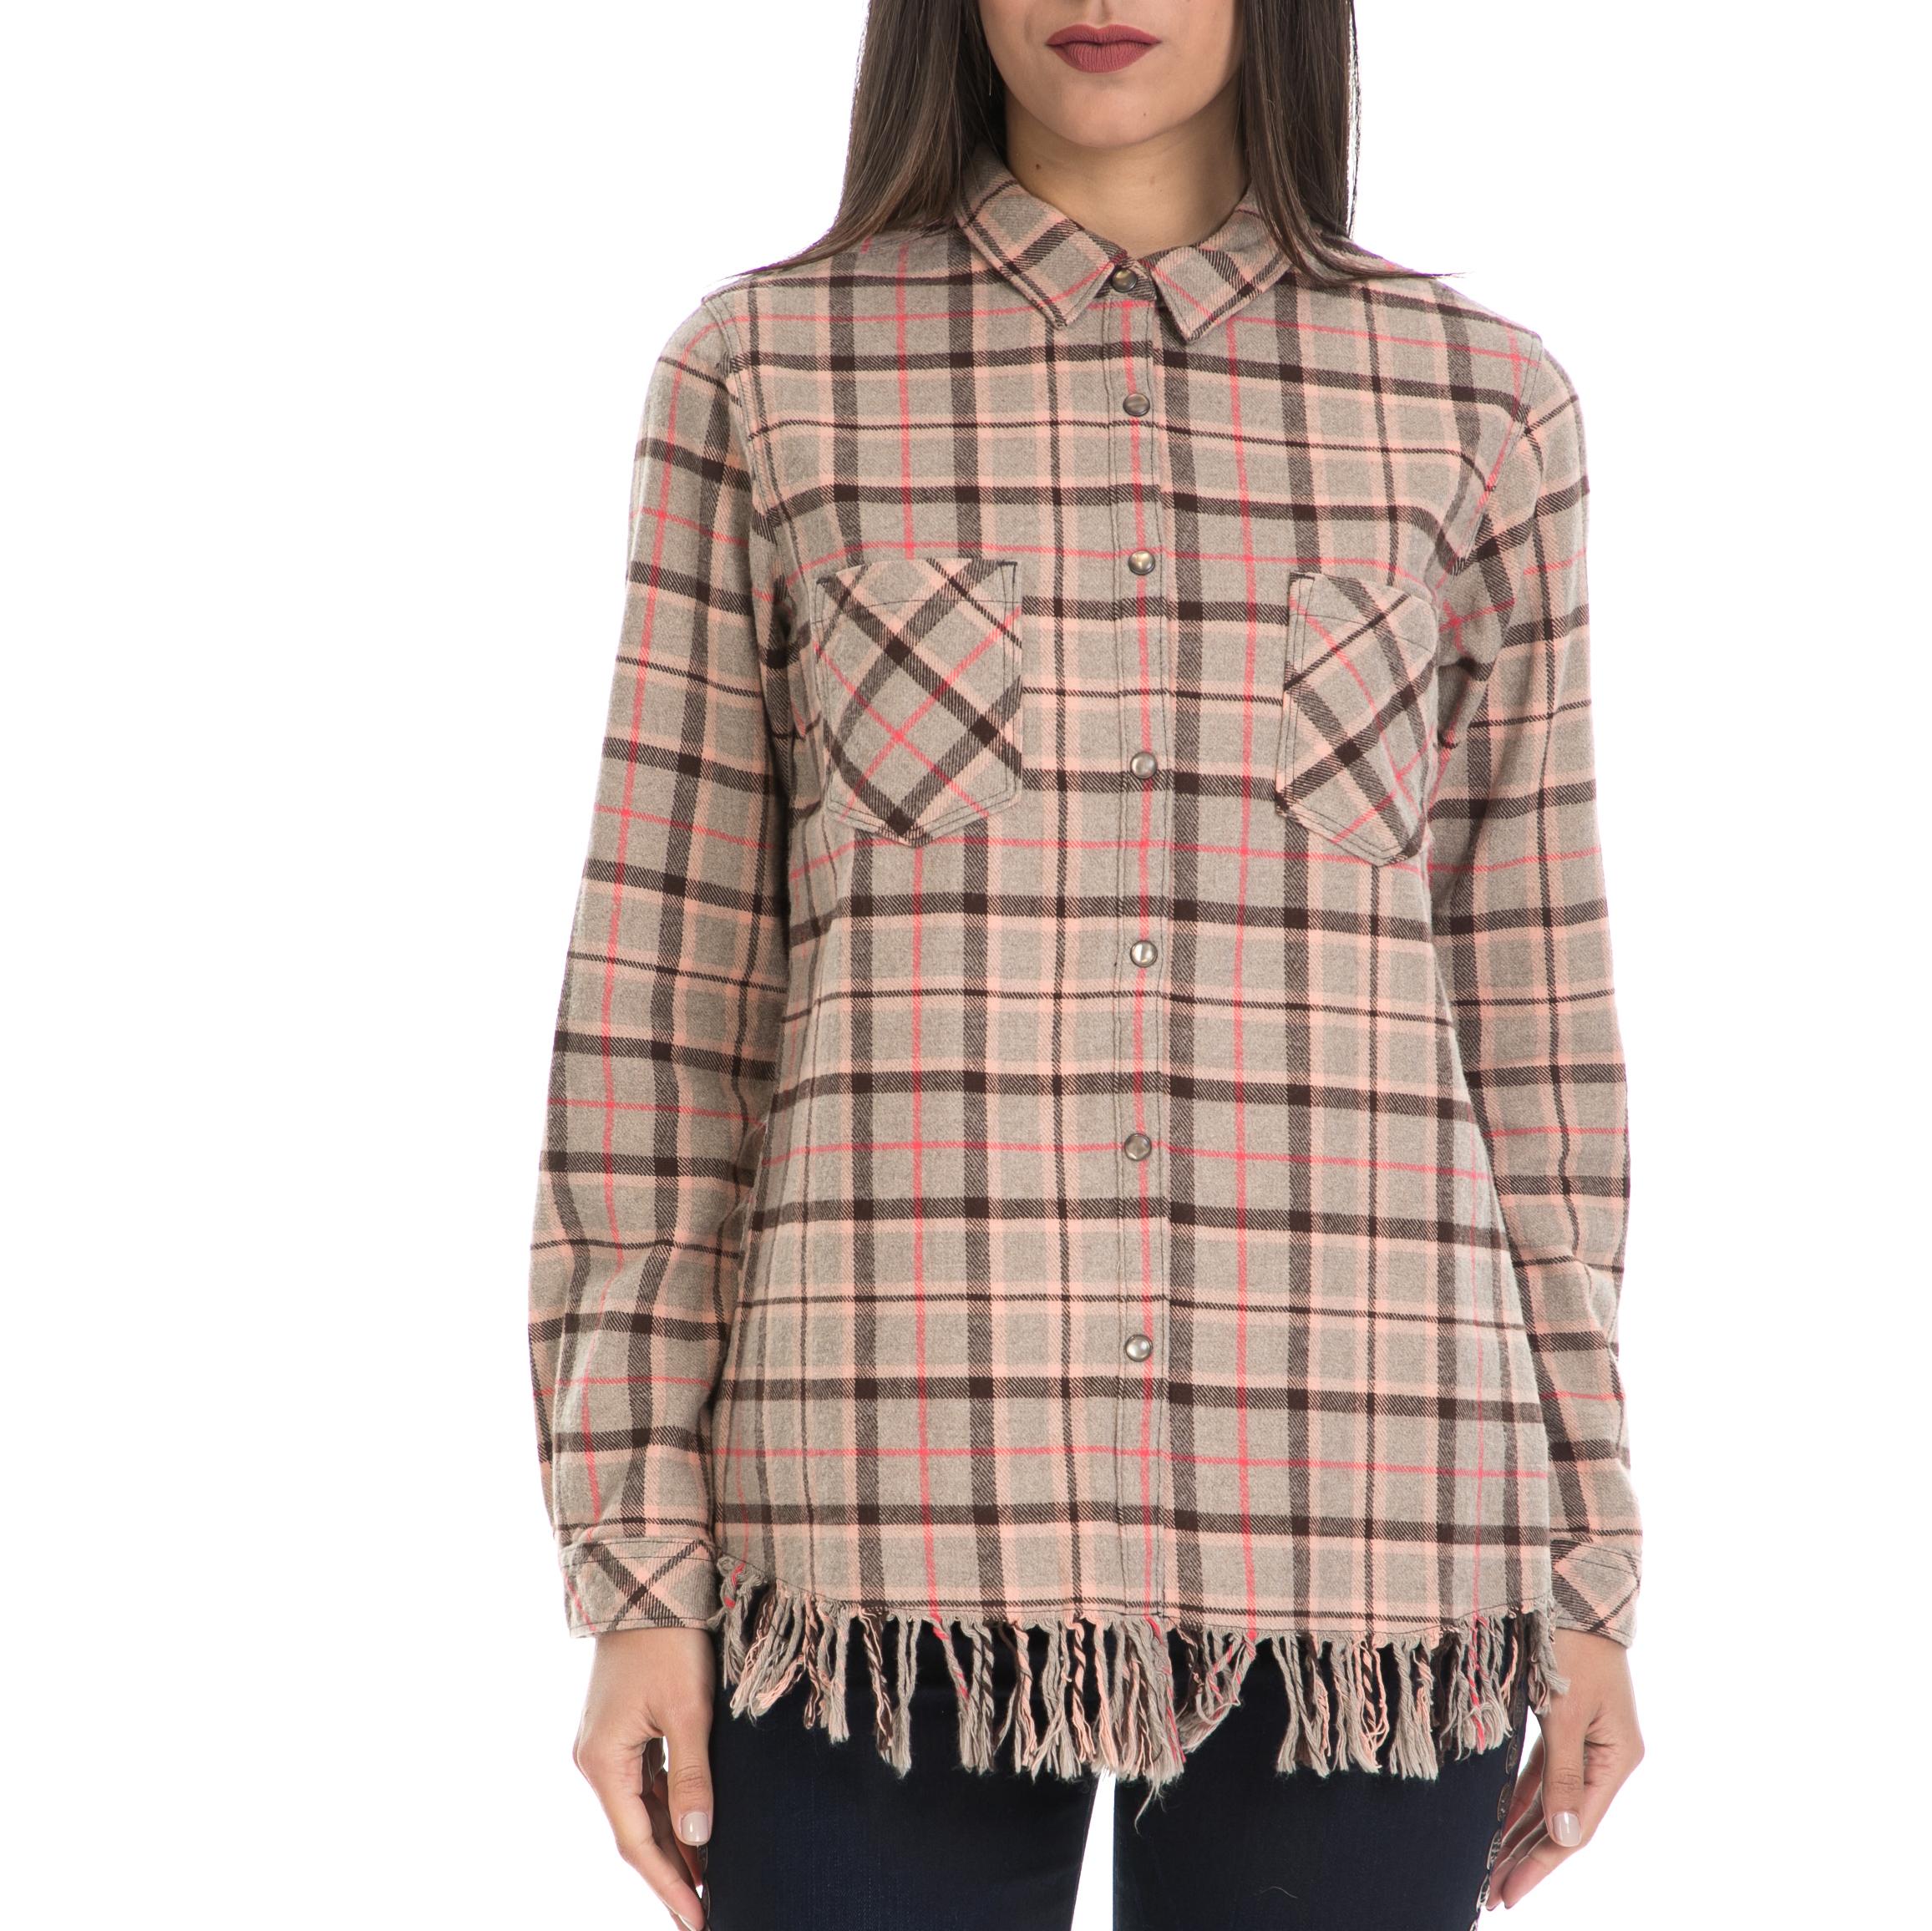 a2b427b6a8b2 SCOTCH   SODA - Γυναικείο πουκάμισο MAISON SCOTCH μπεζ-καφέ